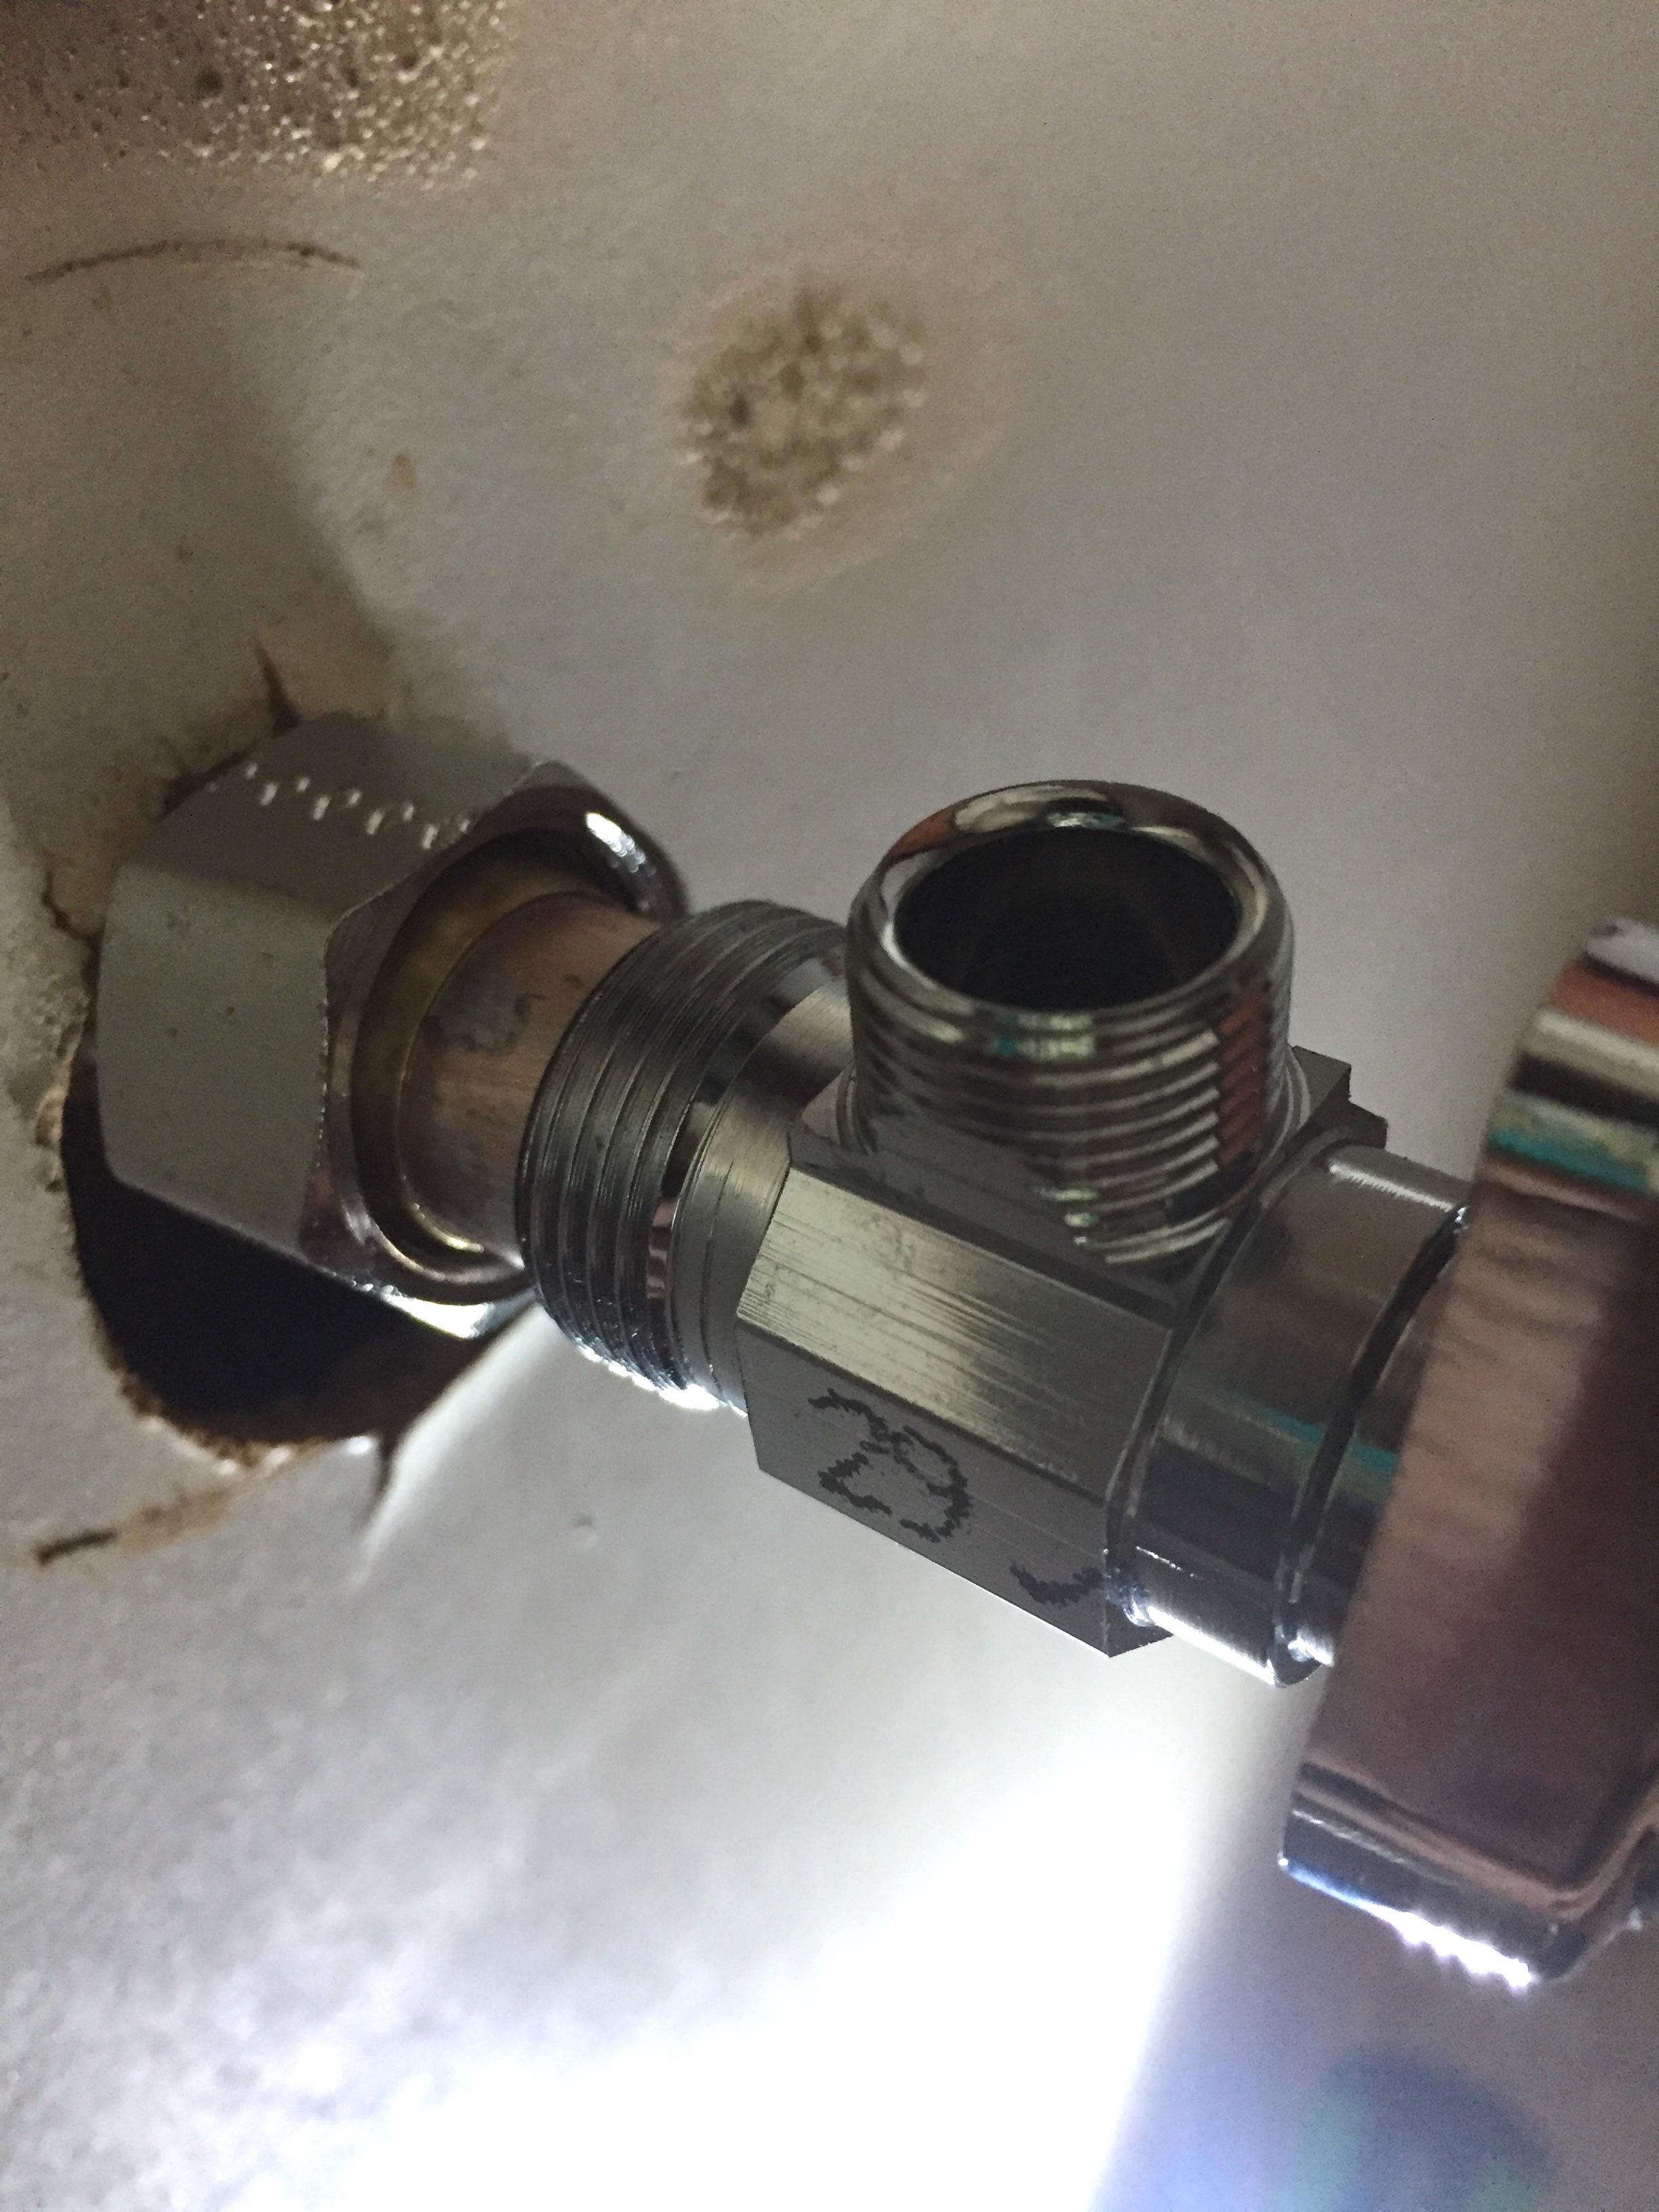 Replacing a Shut-off Valve: sweat valve to compression valve ...